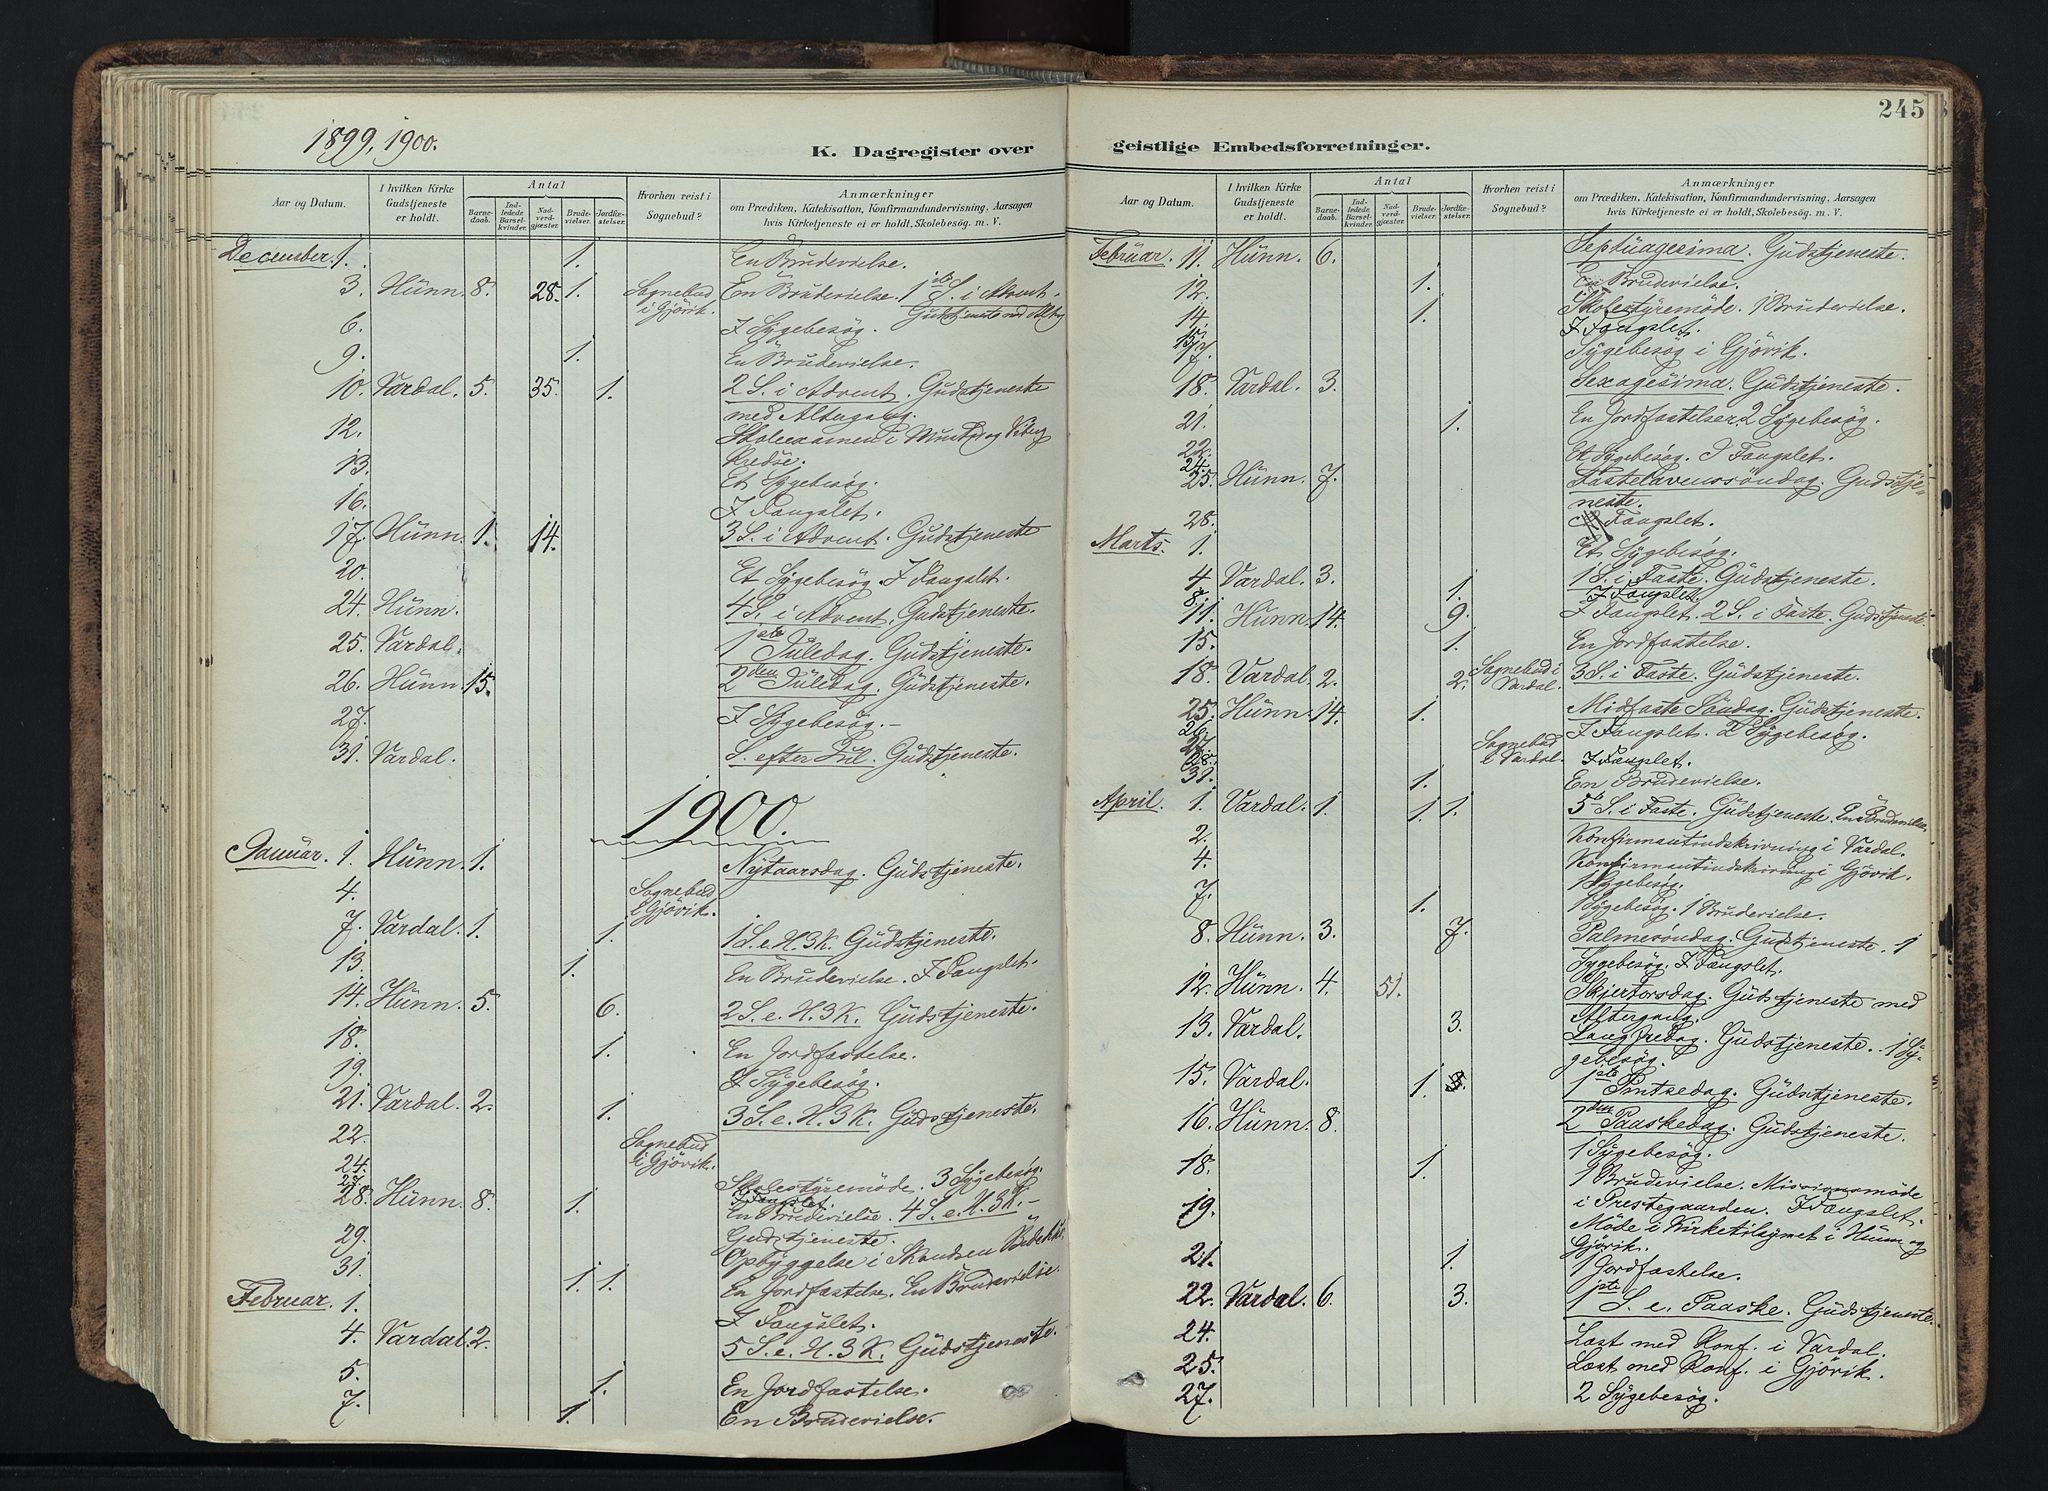 SAH, Vardal prestekontor, H/Ha/Haa/L0019: Ministerialbok nr. 19, 1893-1907, s. 245